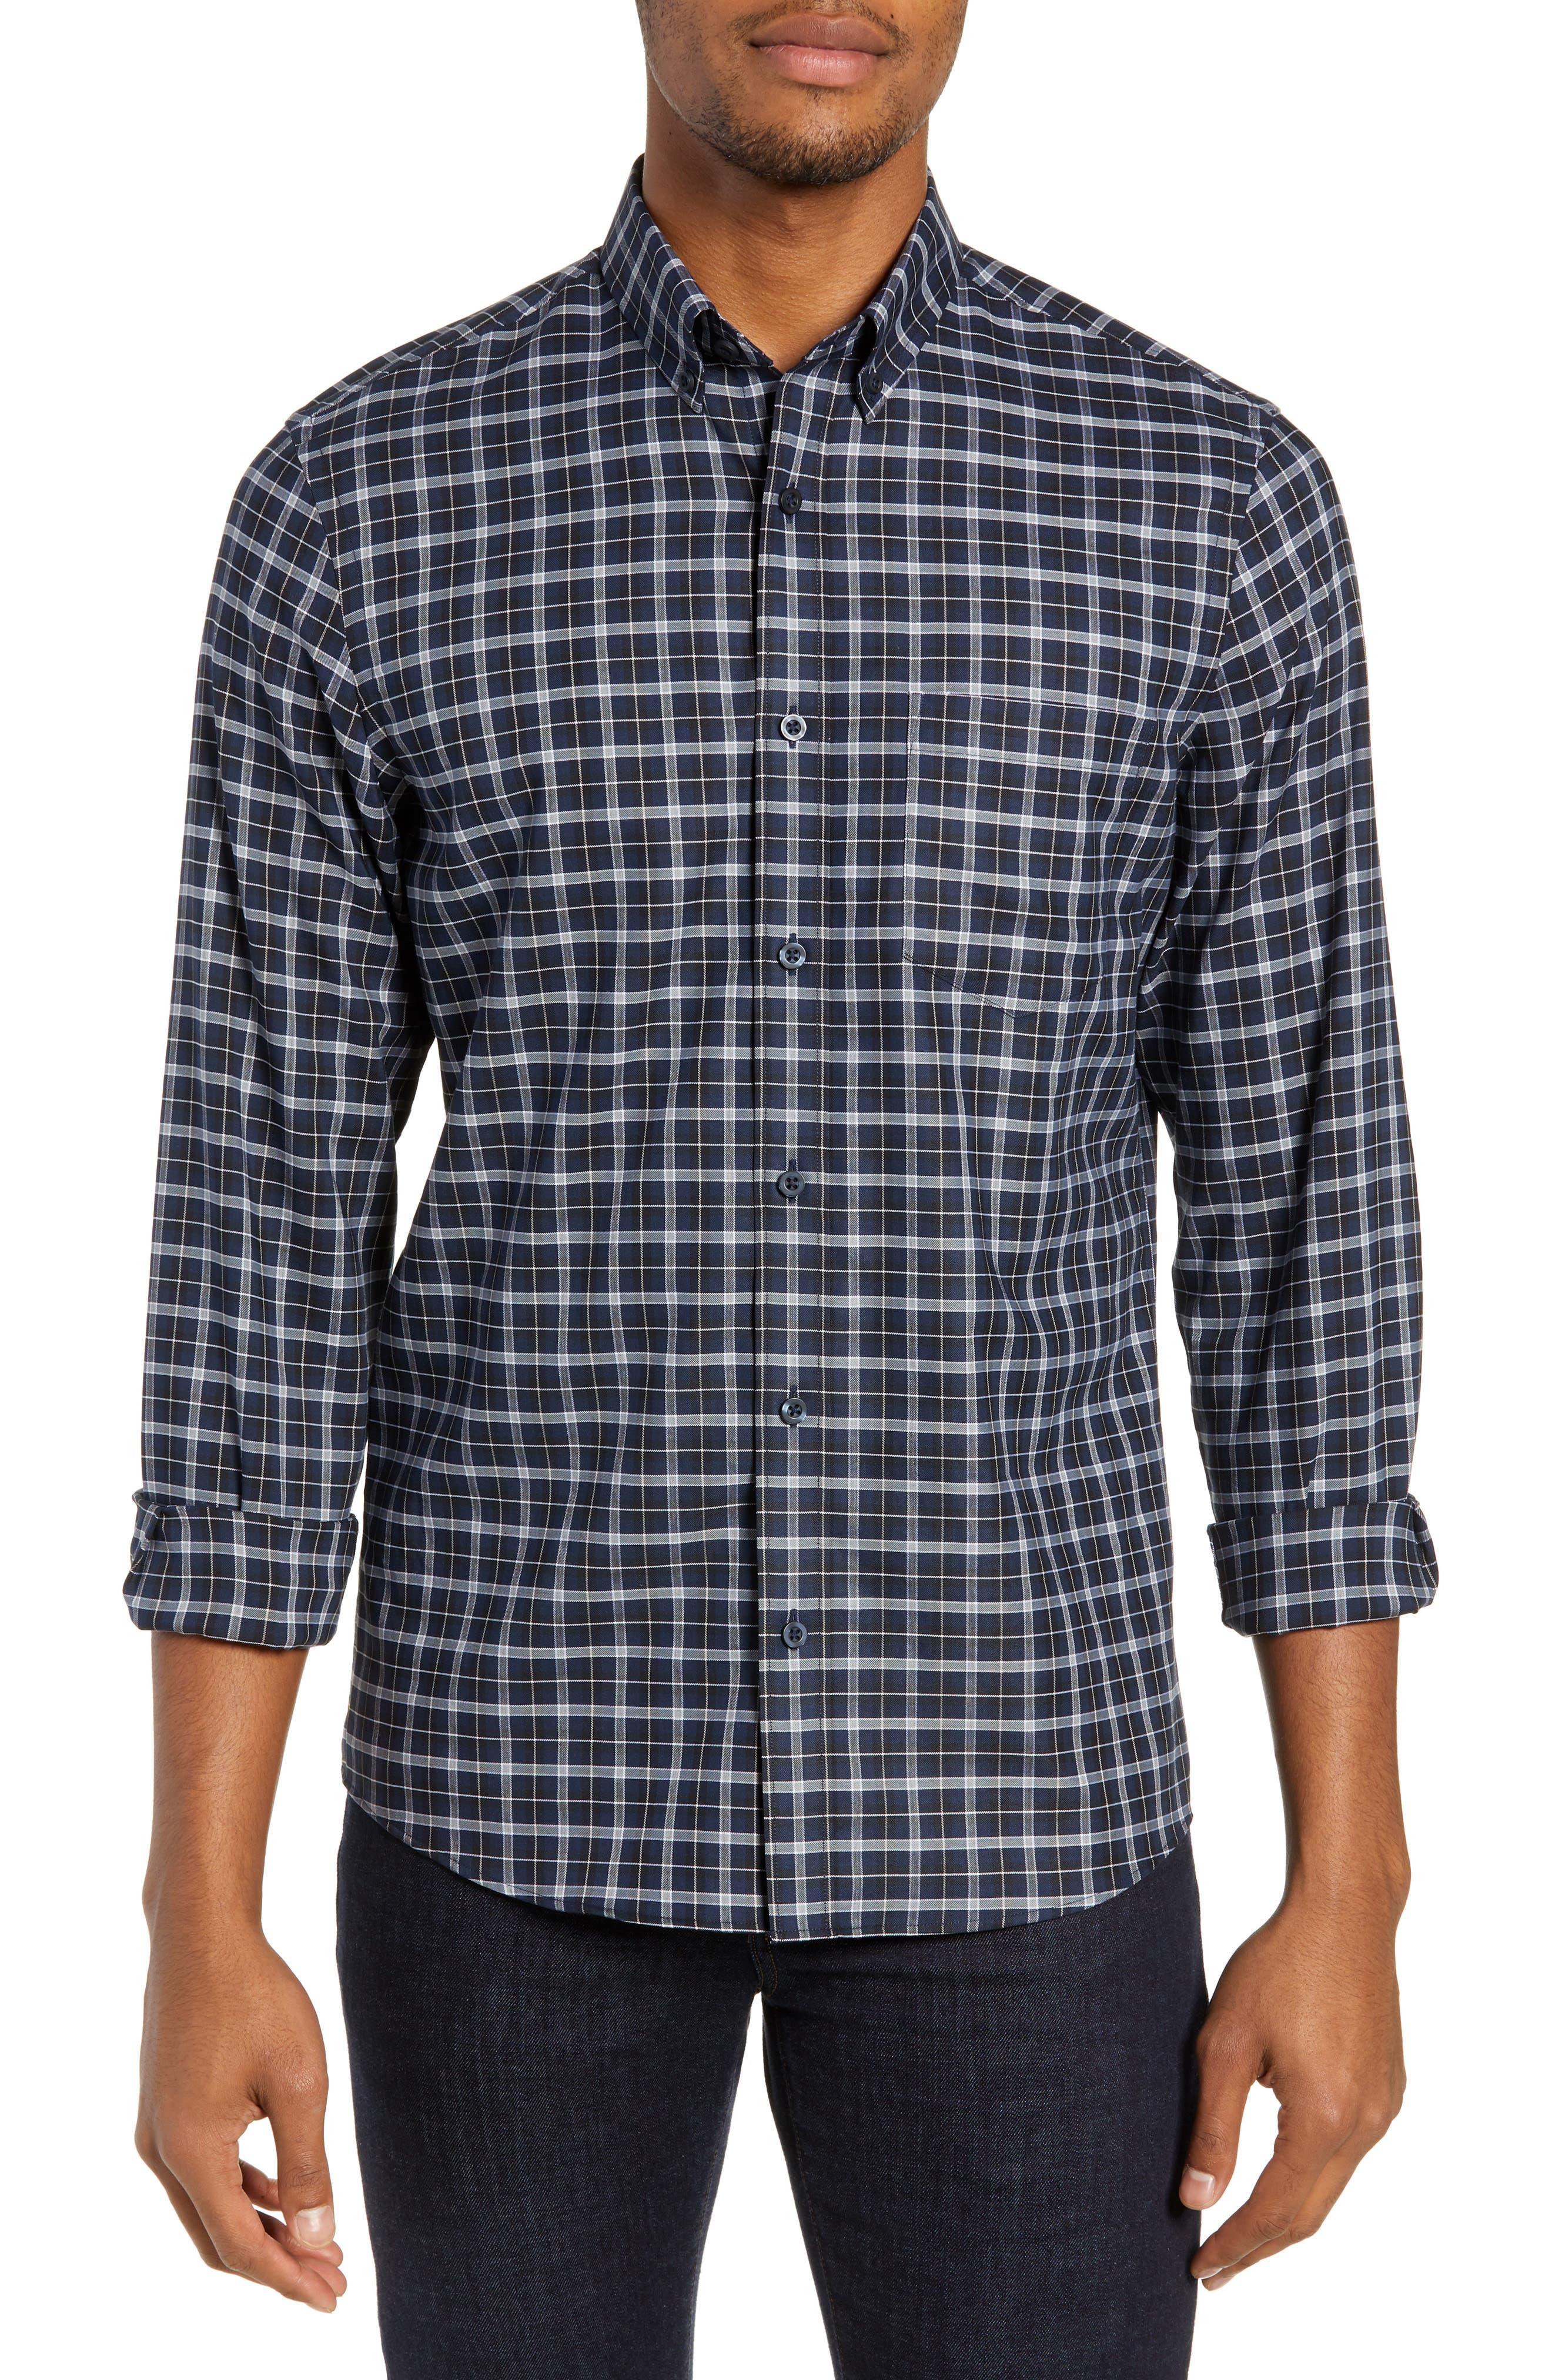 NORDSTROM MEN'S SHOP Tech-Smart Slim Fit Check Sport Shirt, Main, color, NAVY IRIS BLACK CHECK